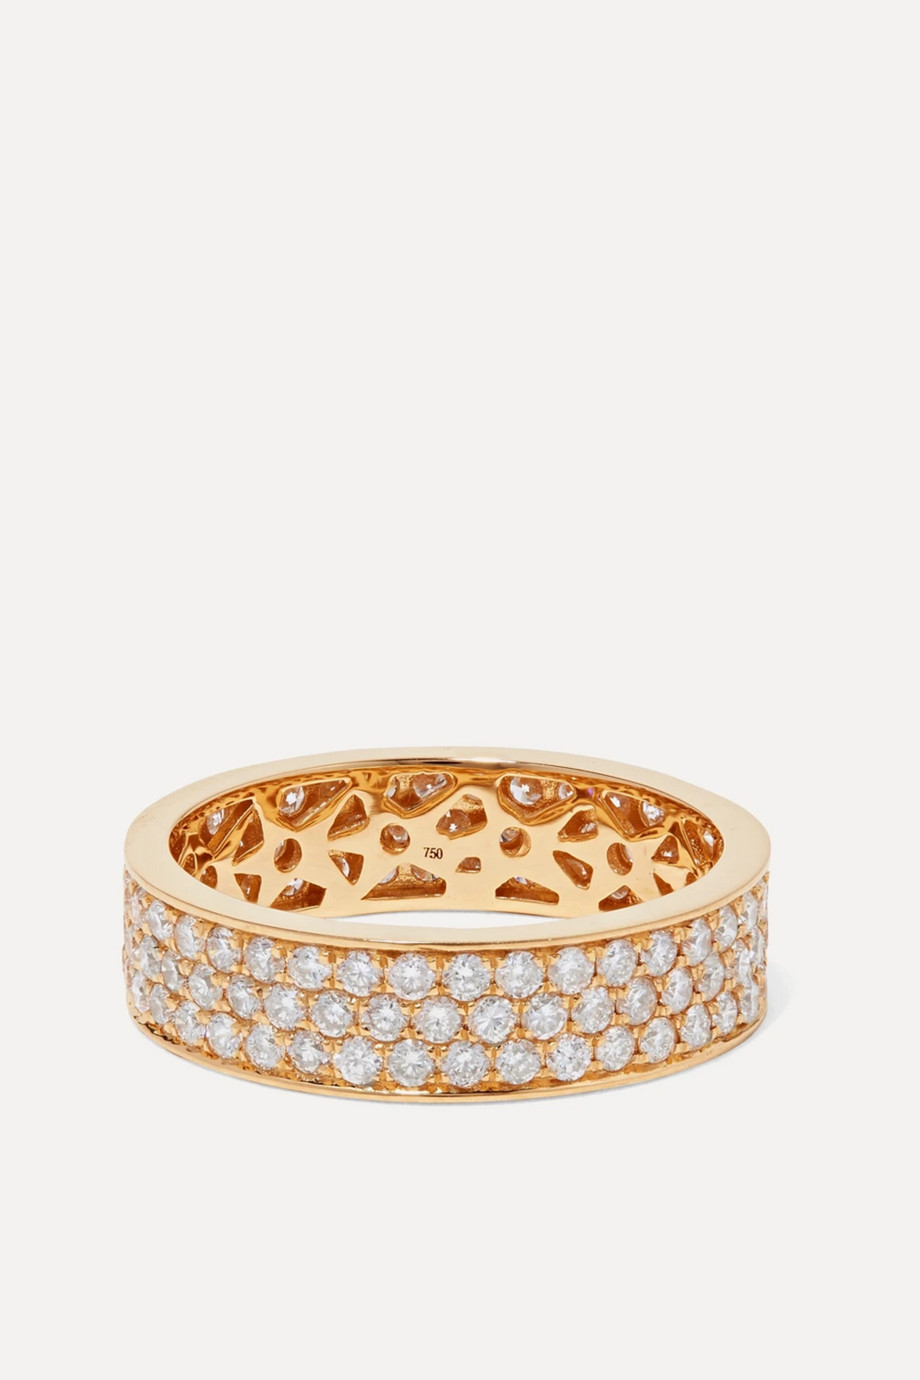 OFIRA Cluster 18-karat gold diamond ring